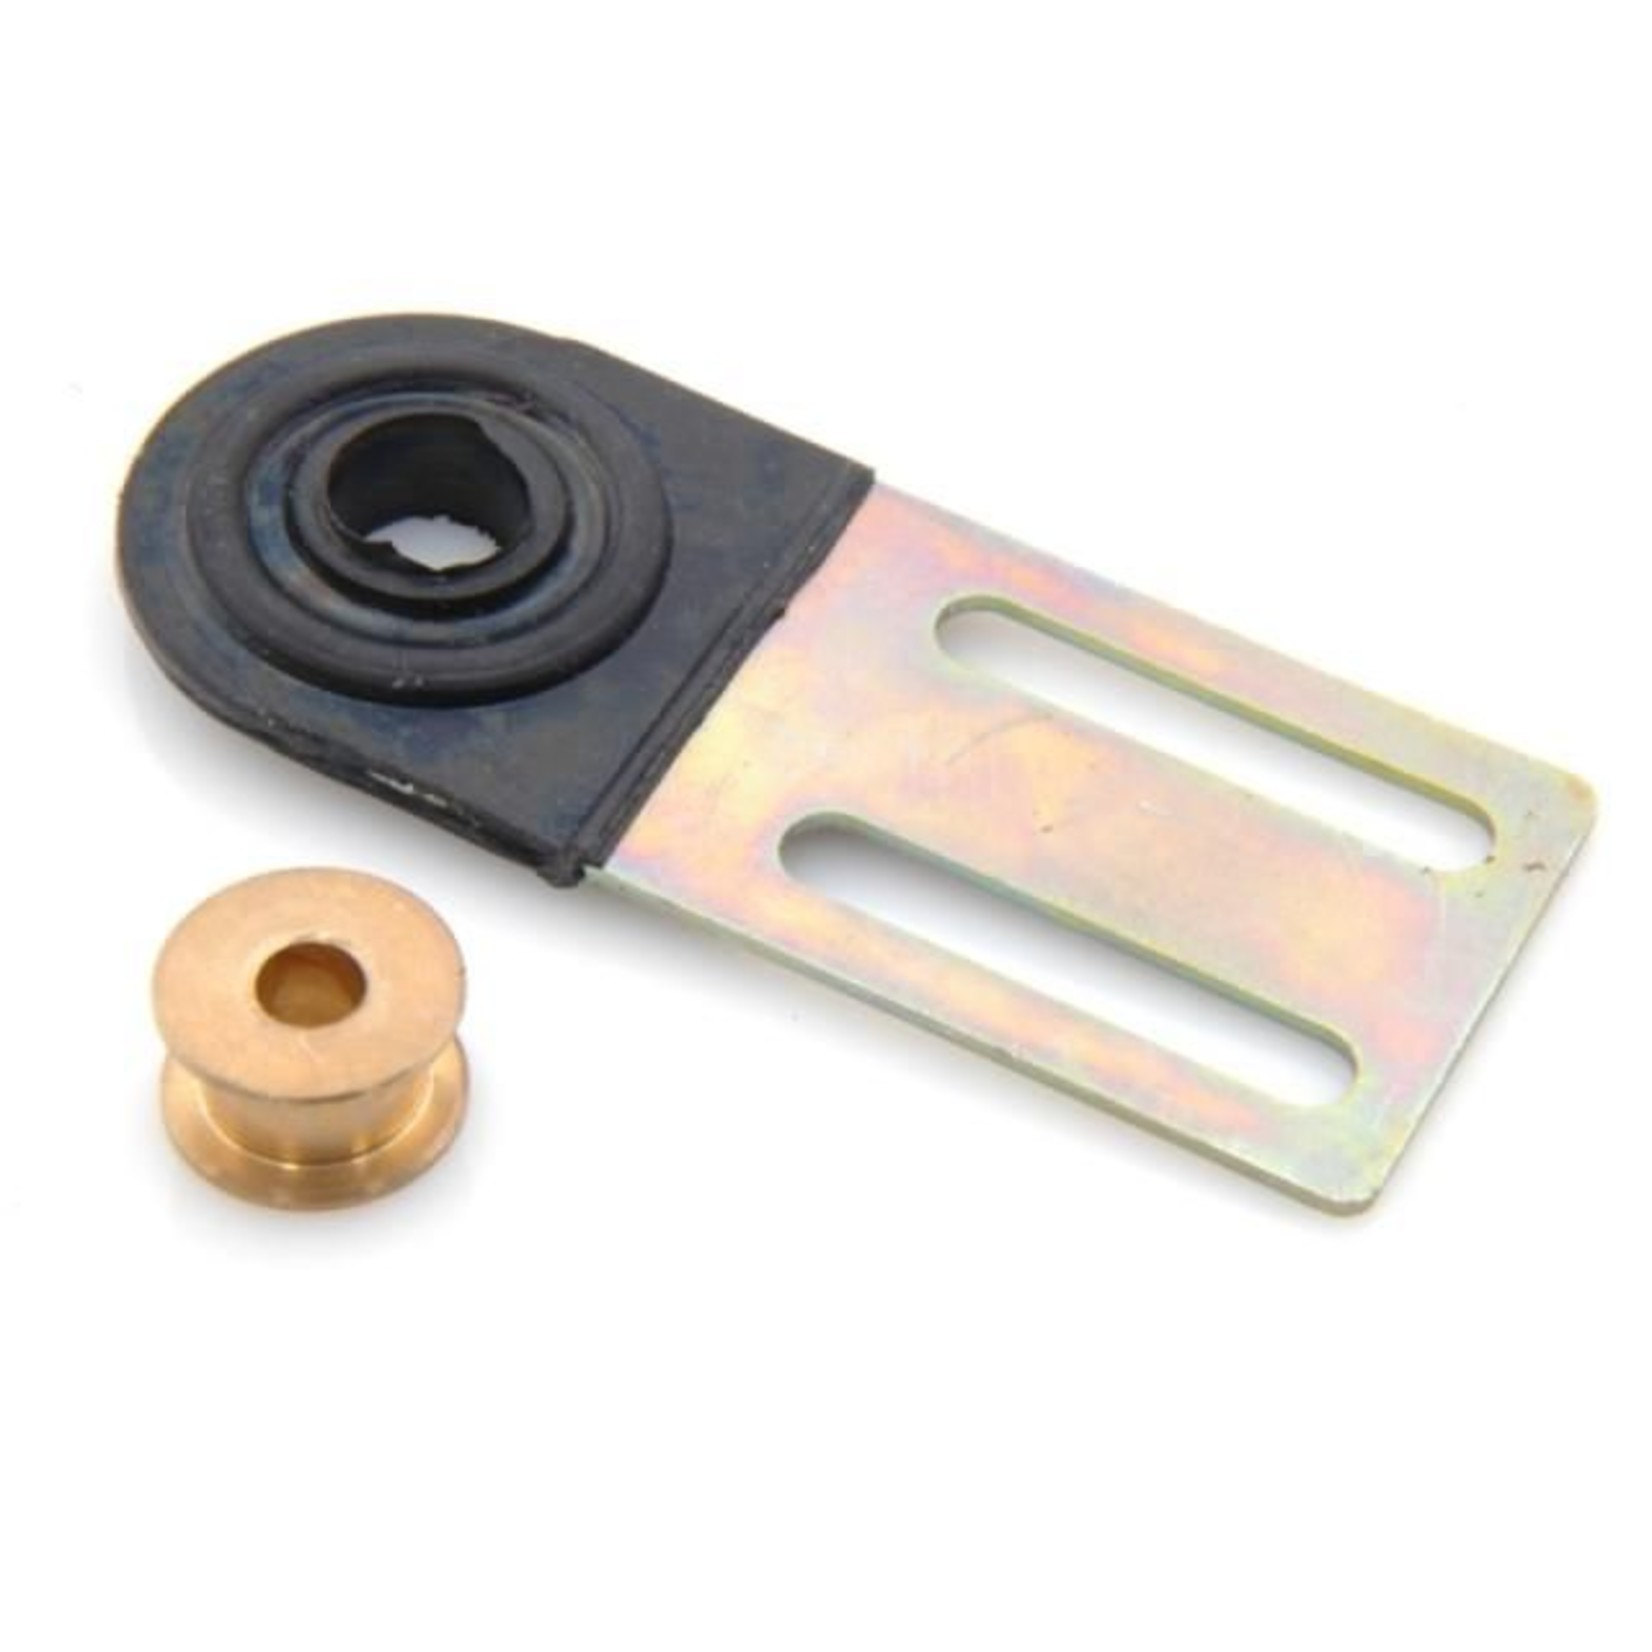 Gasstanghouder 6mm Nr Org: DX142172